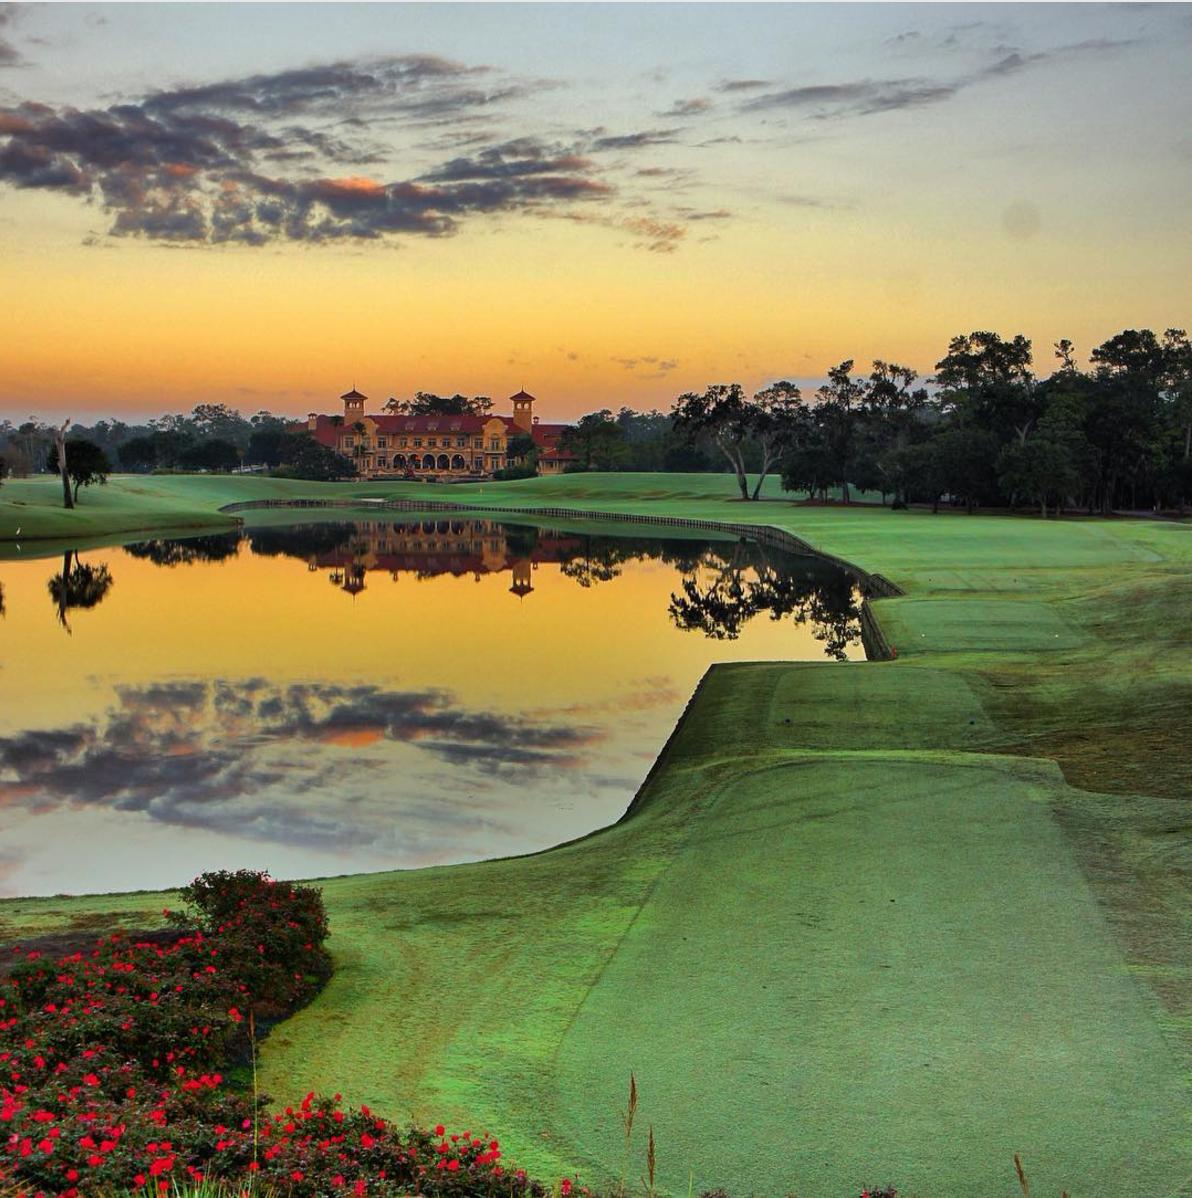 The Week In Instagrams: 02.06.17 Photos - Golf Digest